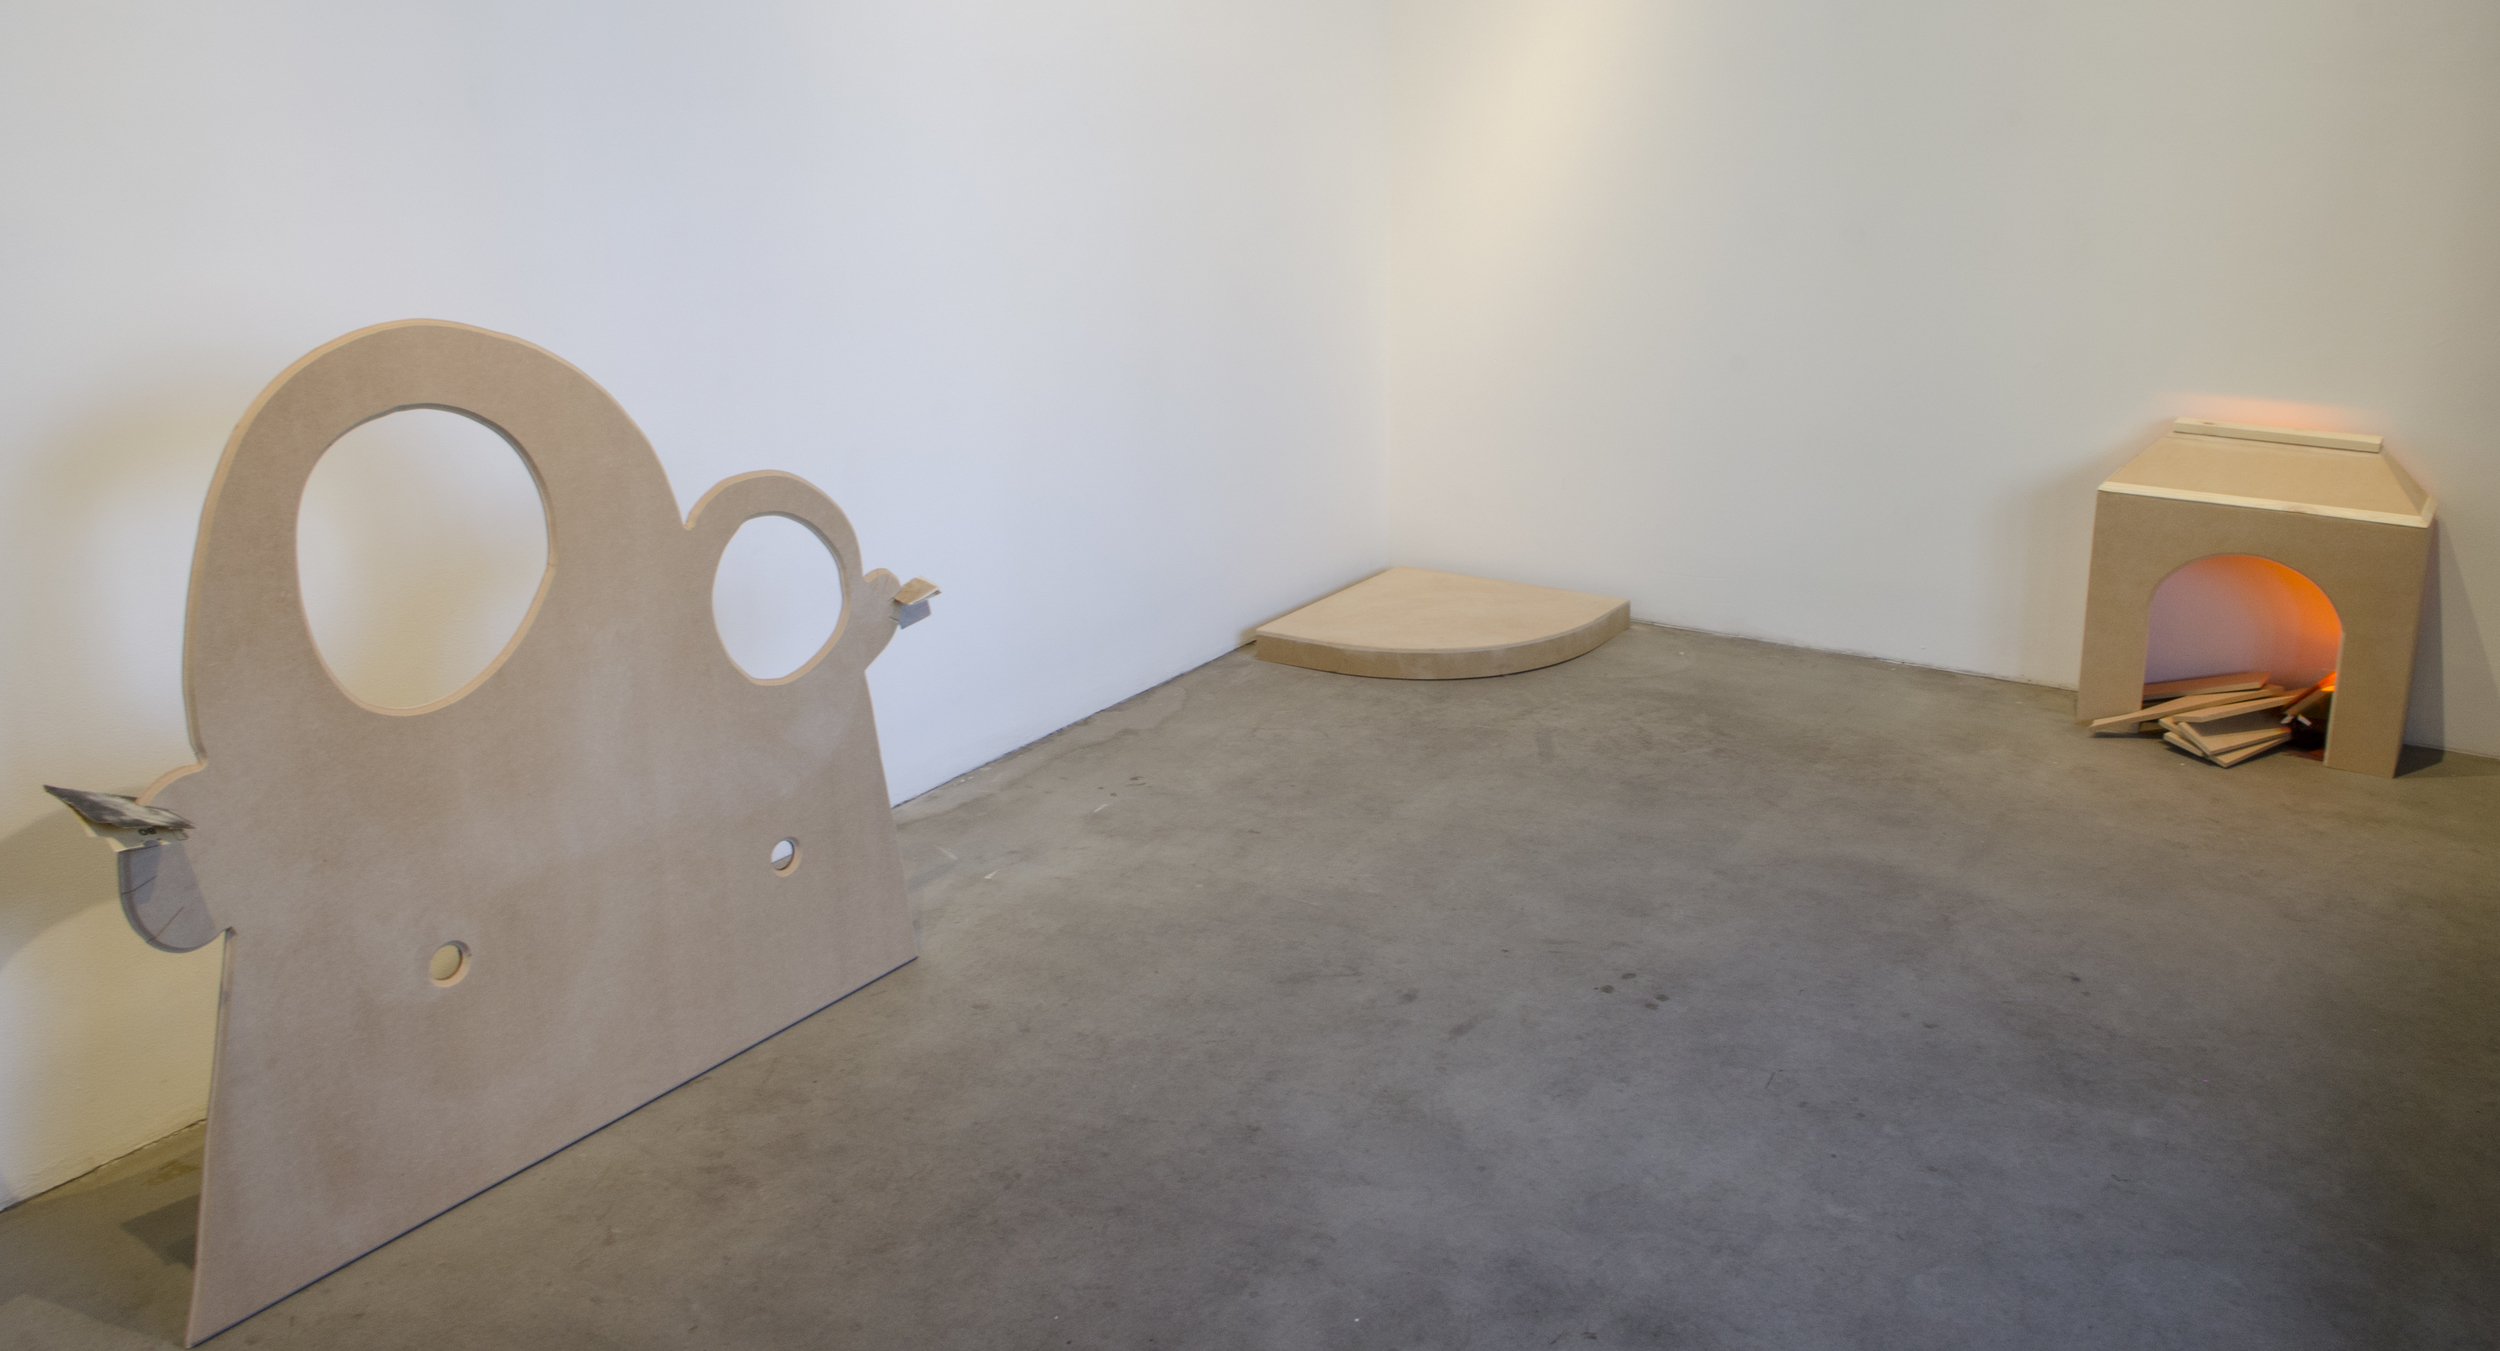 Installation view, photo courtesy of Emma Benschop